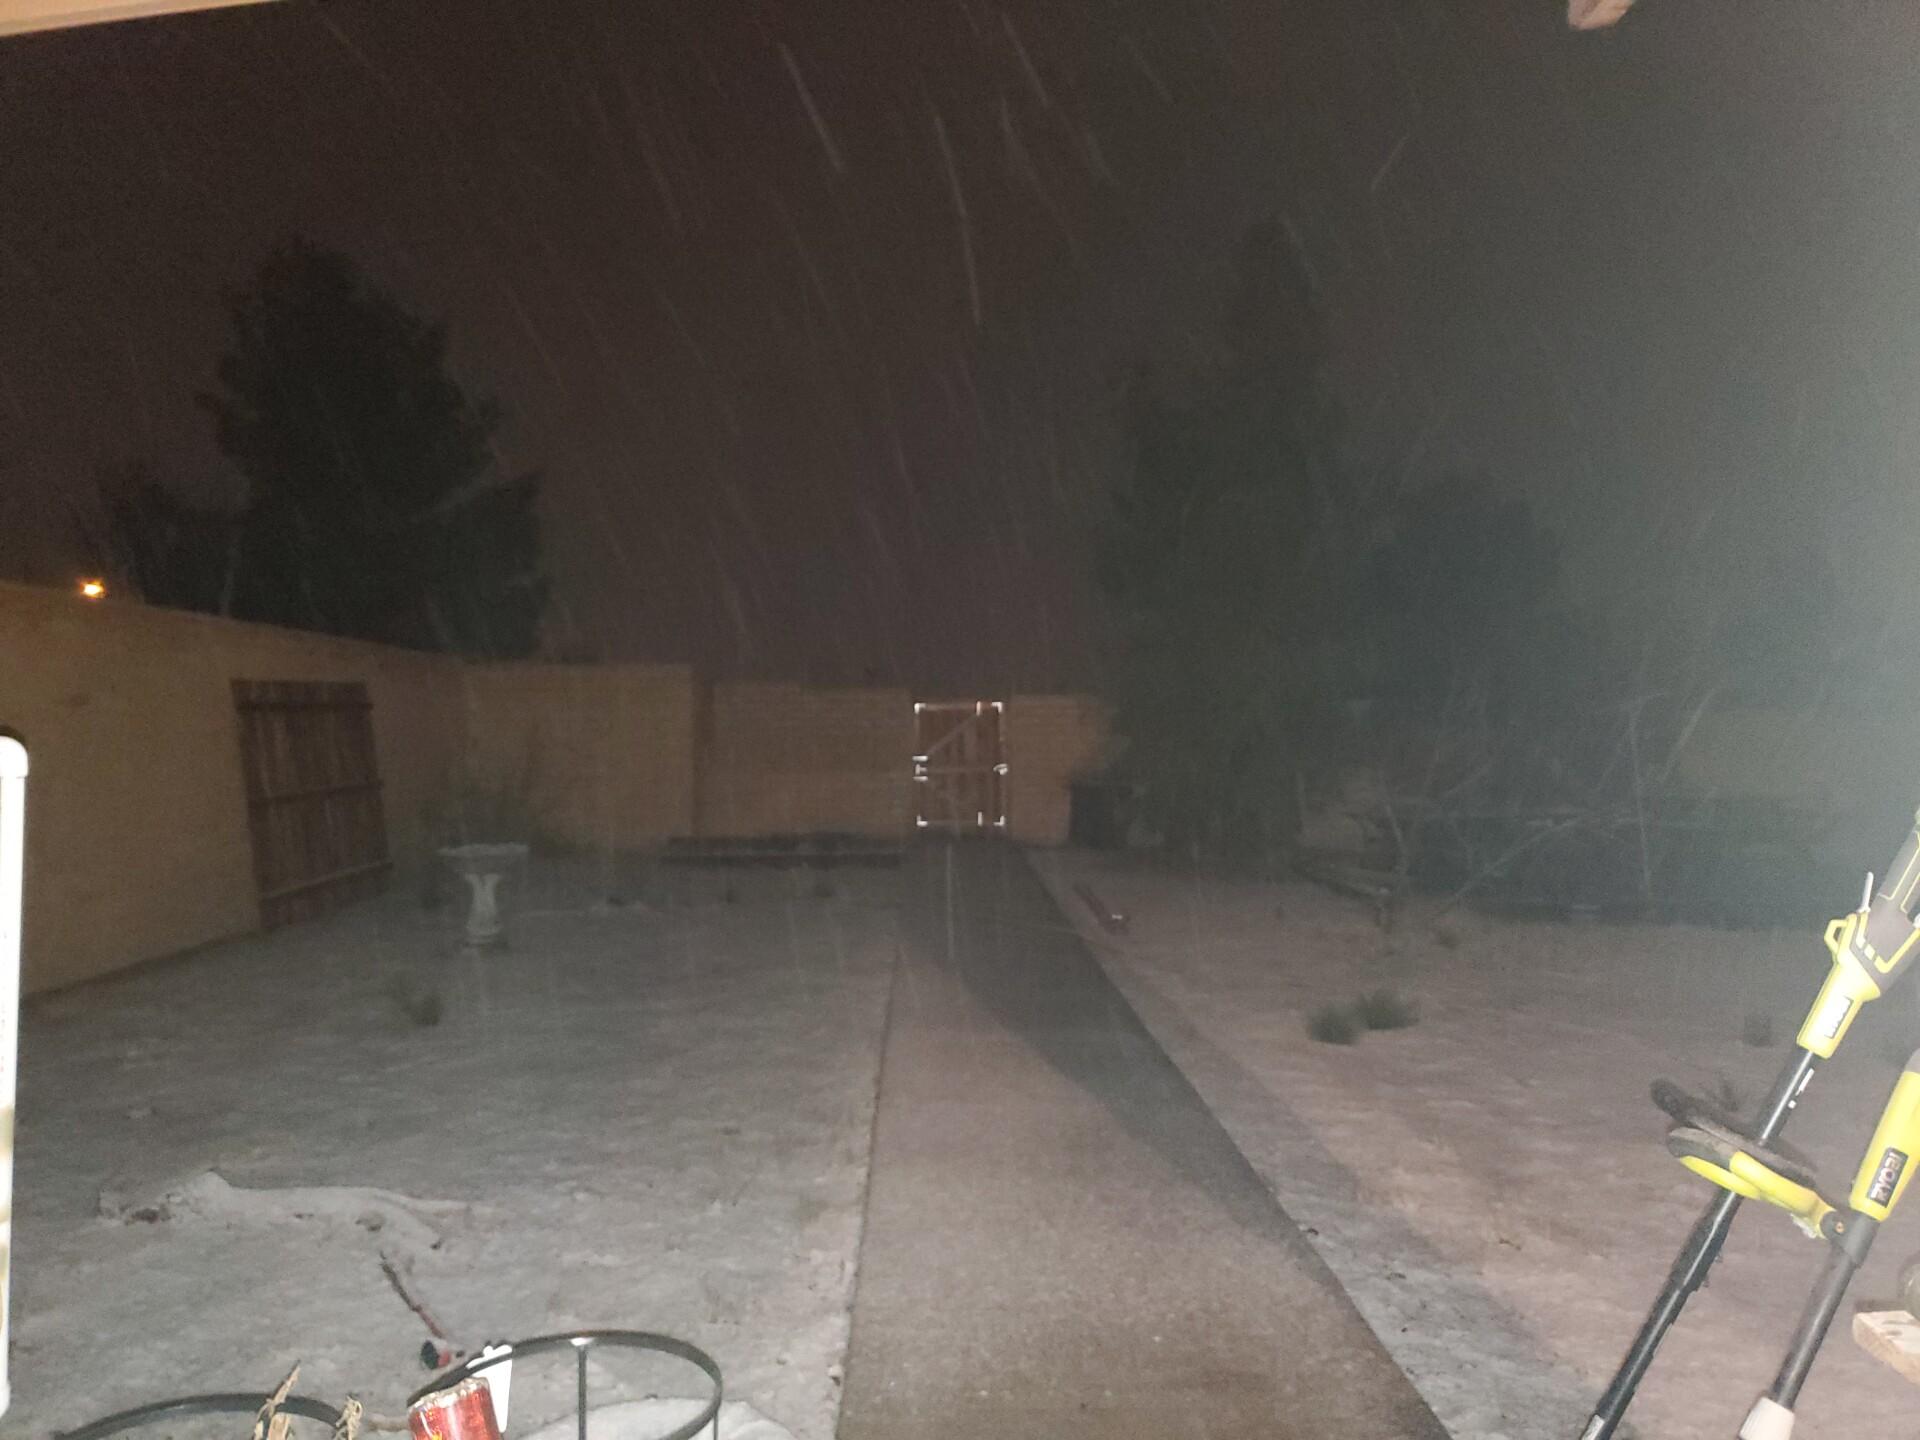 Snow in San Manuel